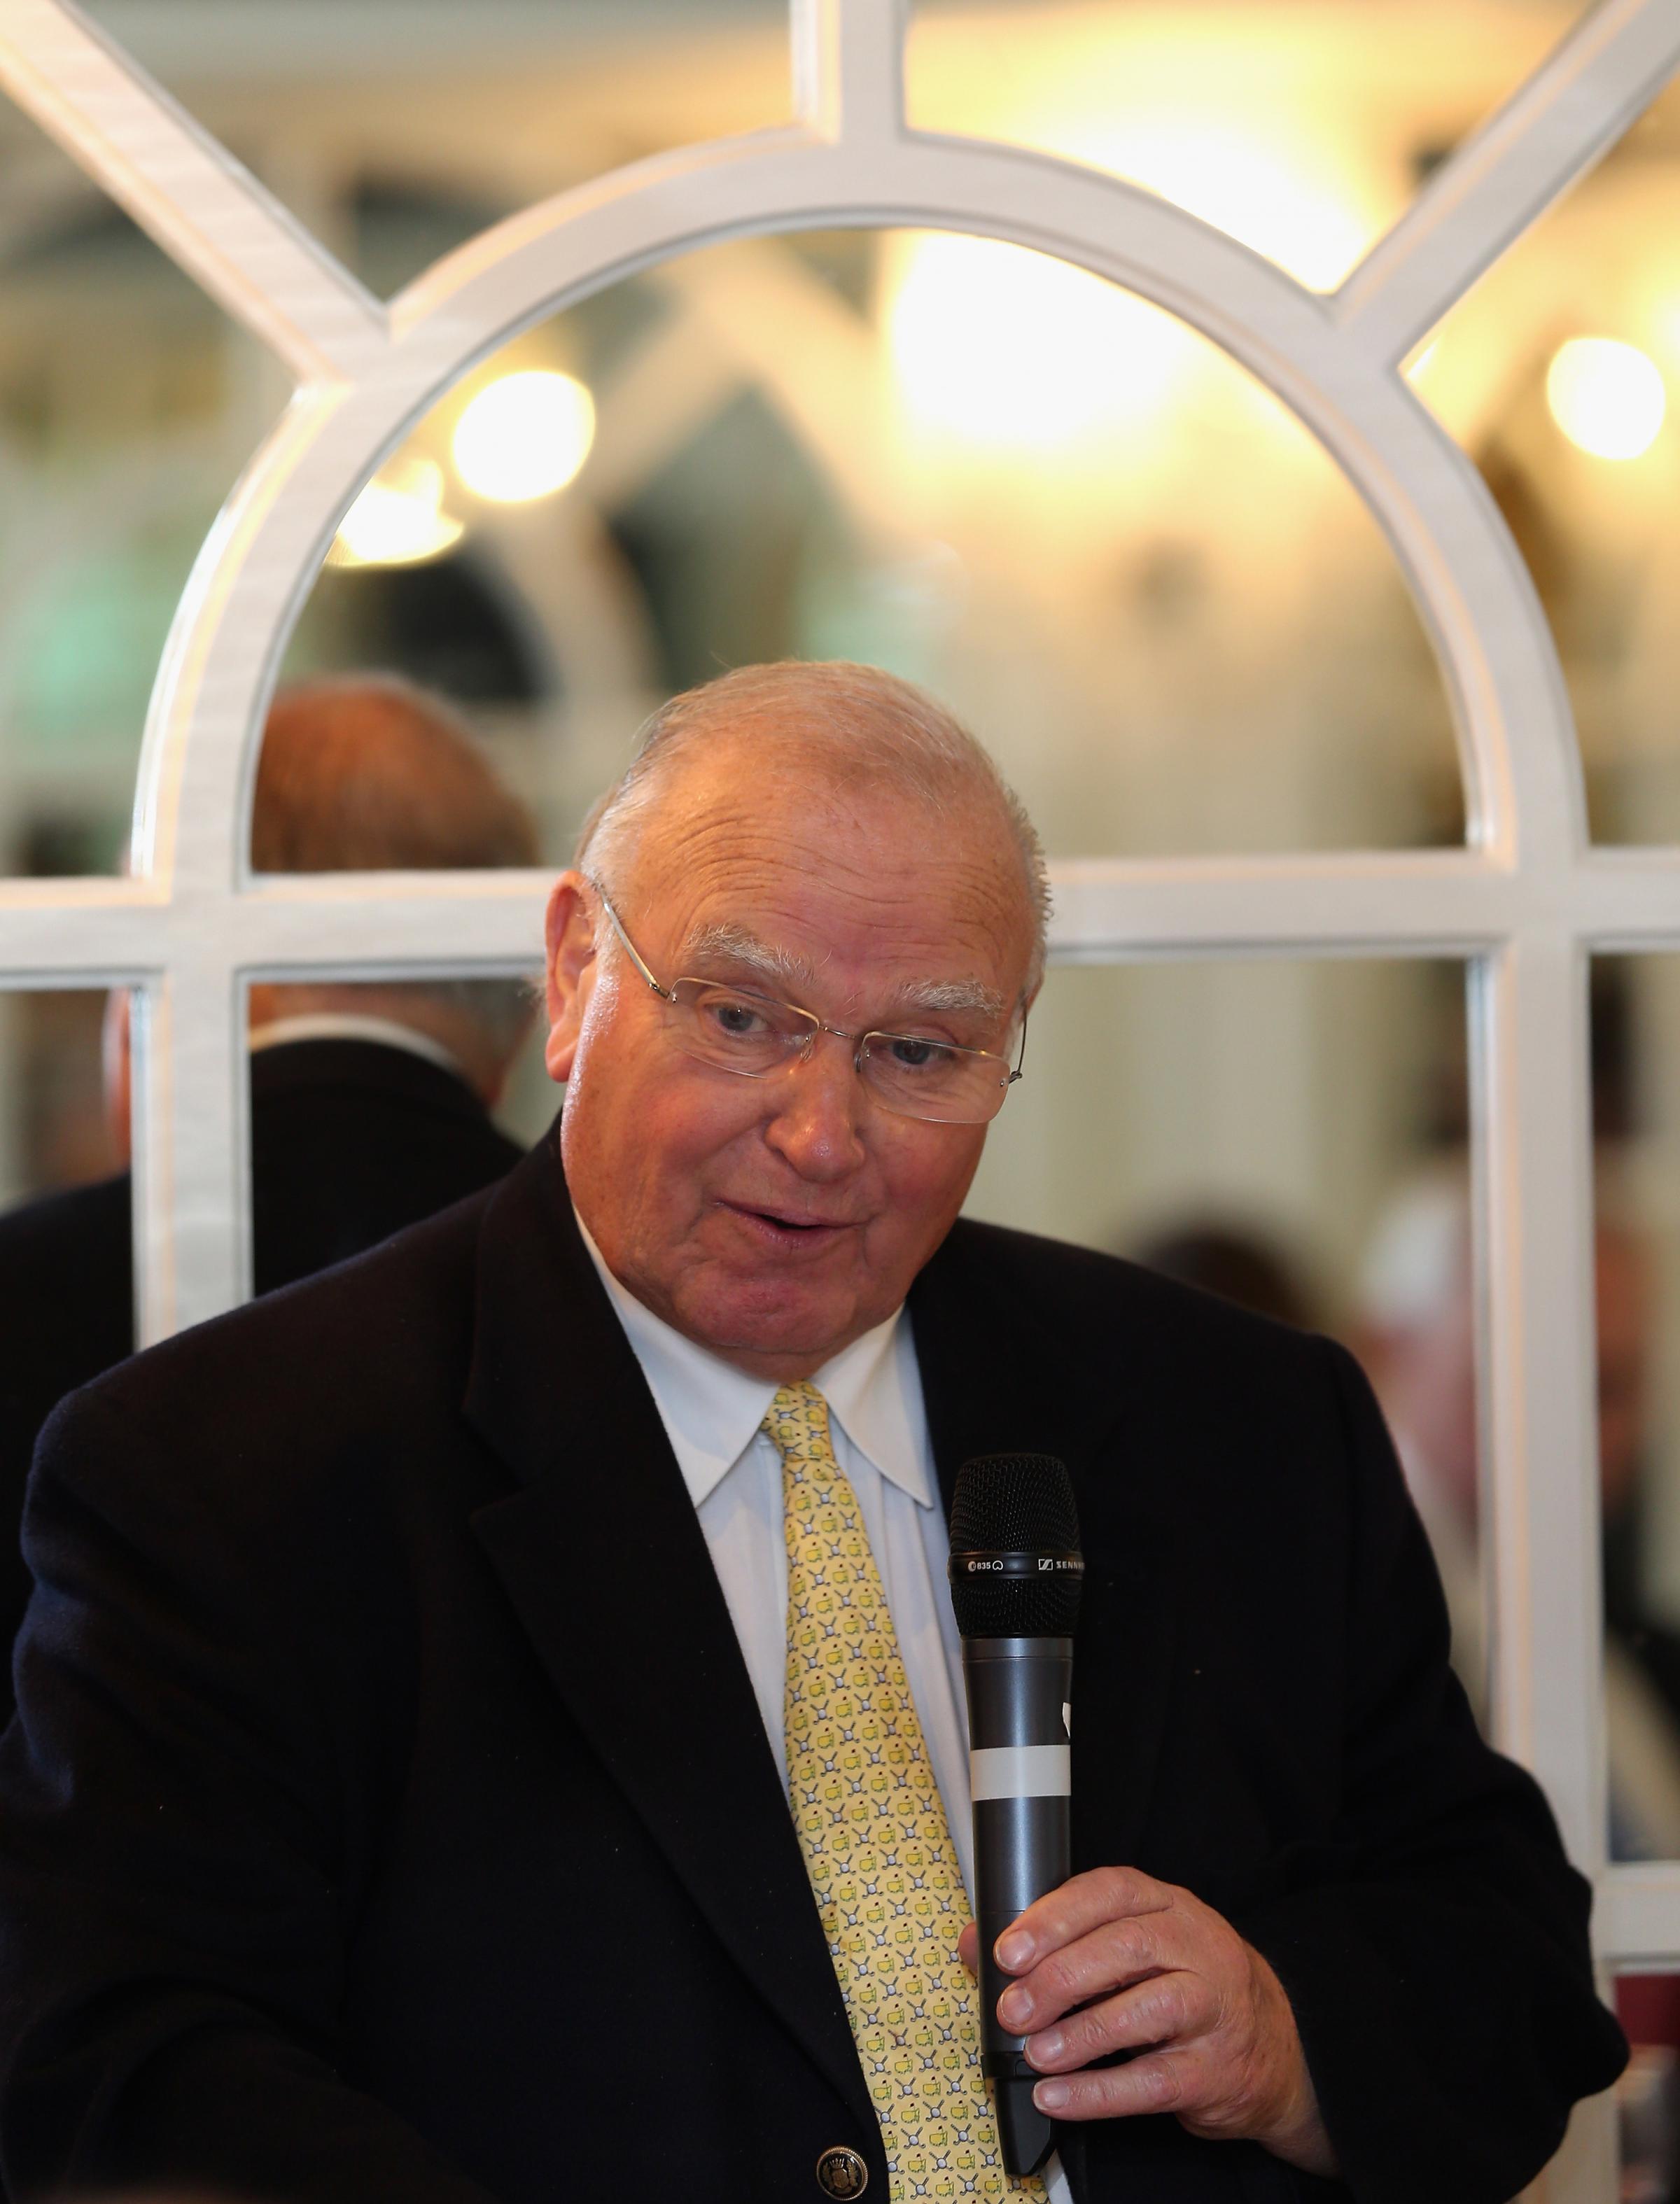 Obituario: Renton Laidlaw, una verdadera voz del golf